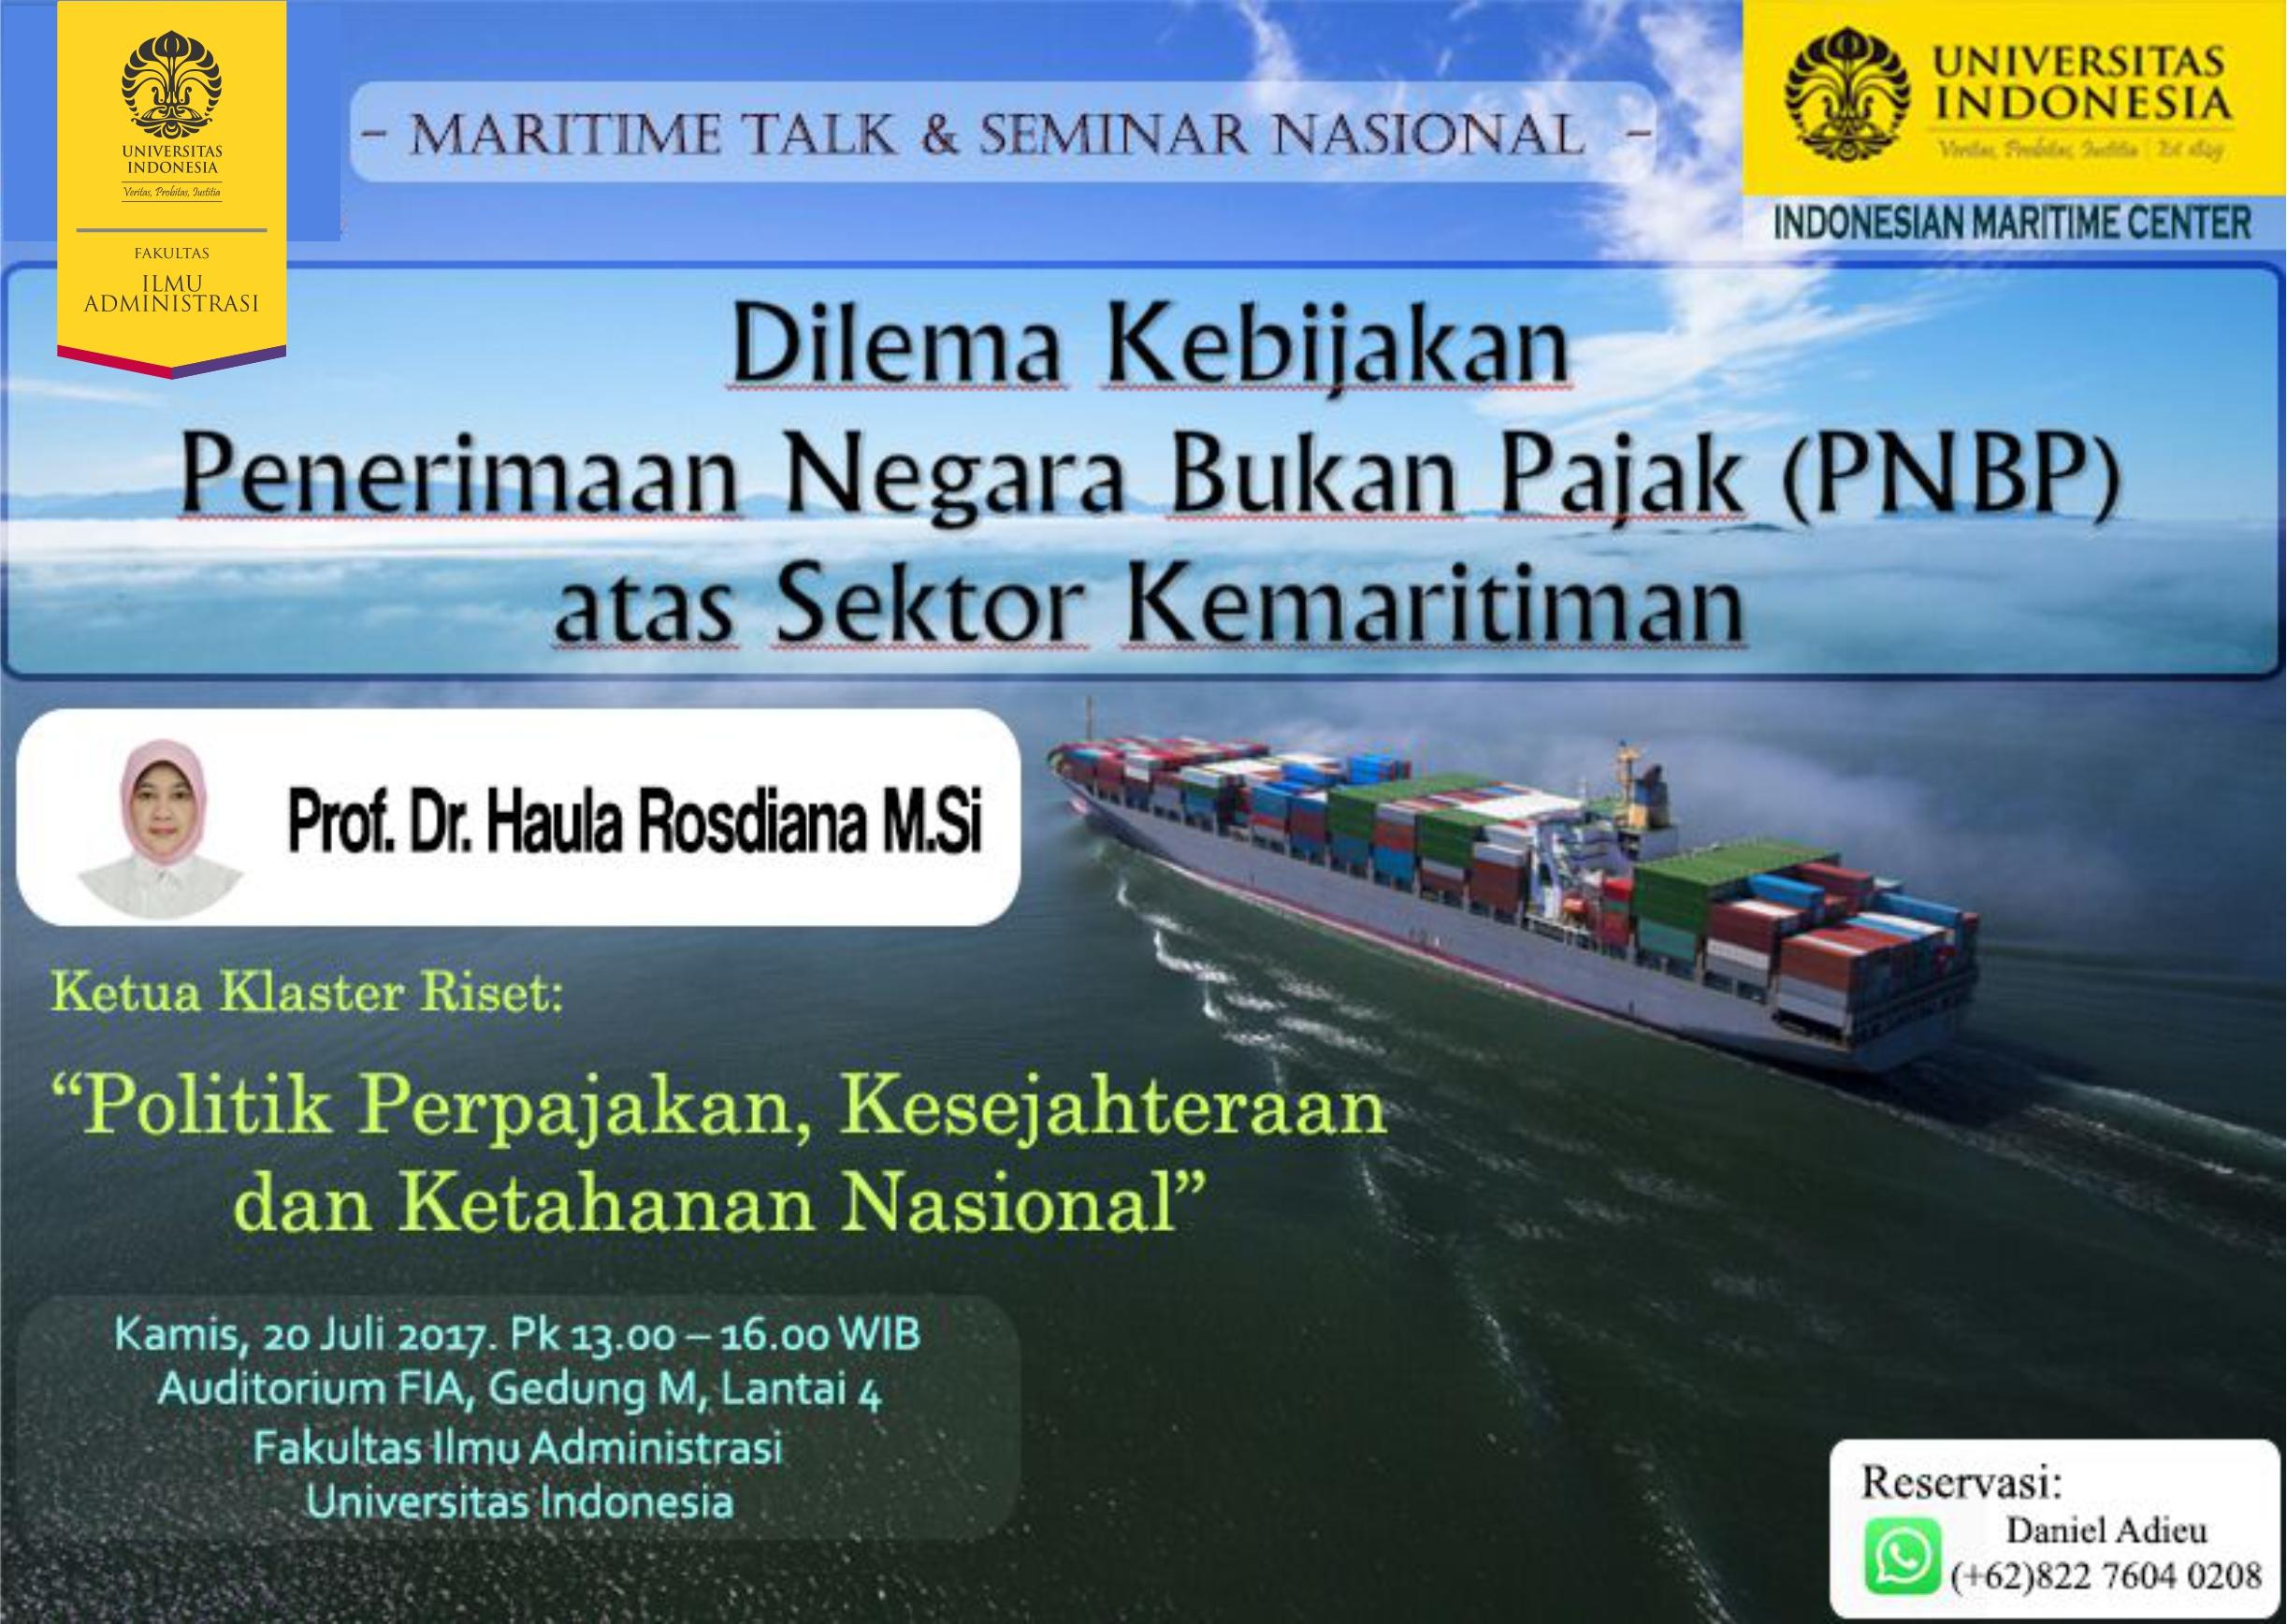 "Seminar Nasional & Maritime Talk ""Dilema Kebijakan Penerimaan Negara Bukan Pajak (PNBP) atas Sektor Kemaritiman"""